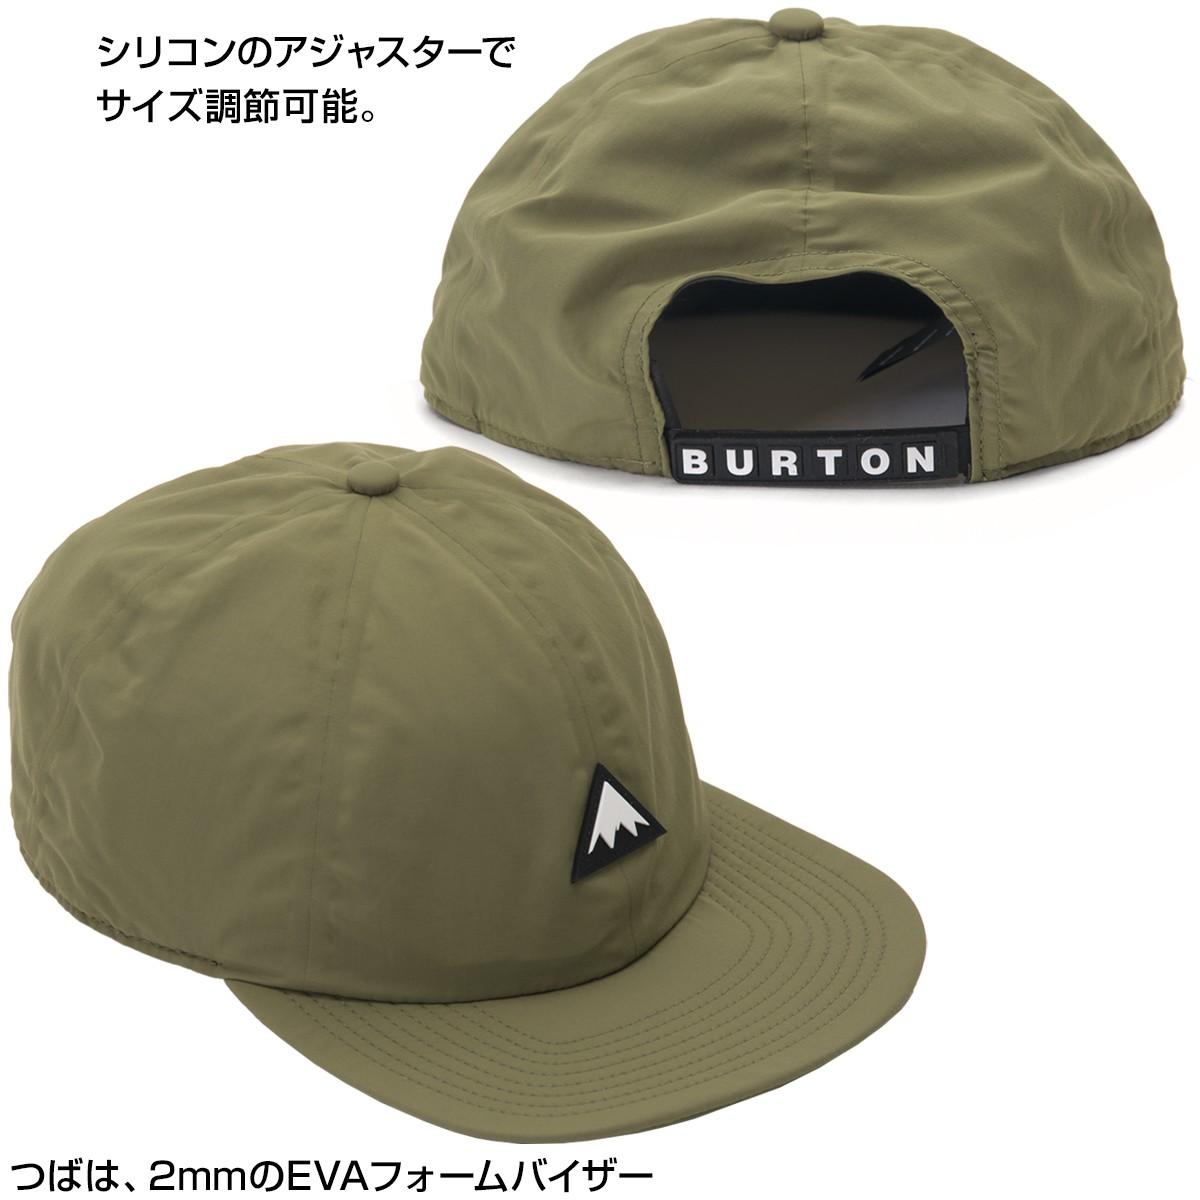 Burton Rad Dad Performance Snapback Hat